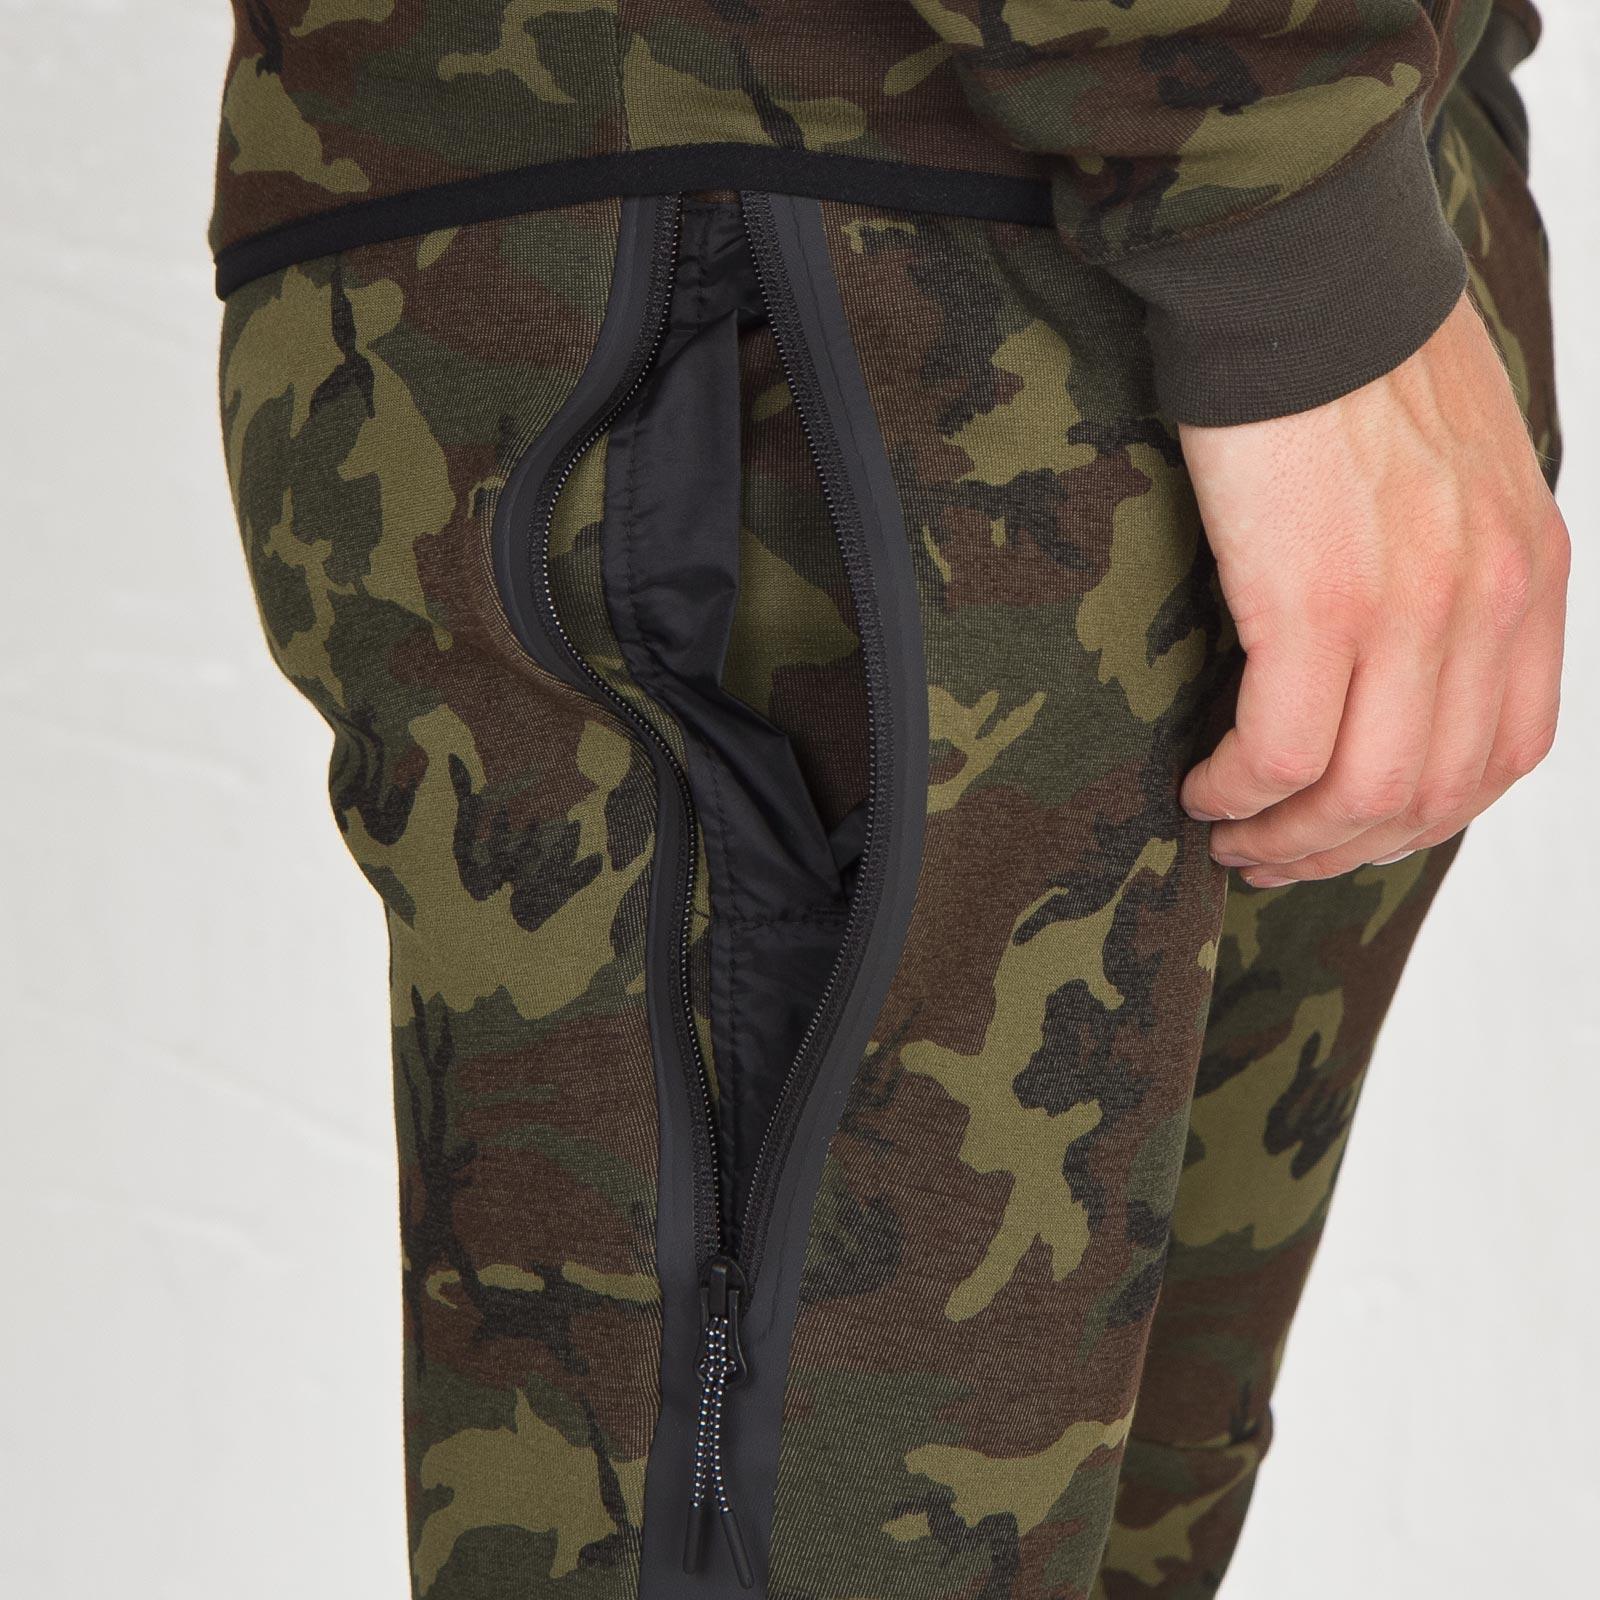 29a06532718c Nike Tech Fleece Pant - Camo - 682852-355 - Sneakersnstuff ...